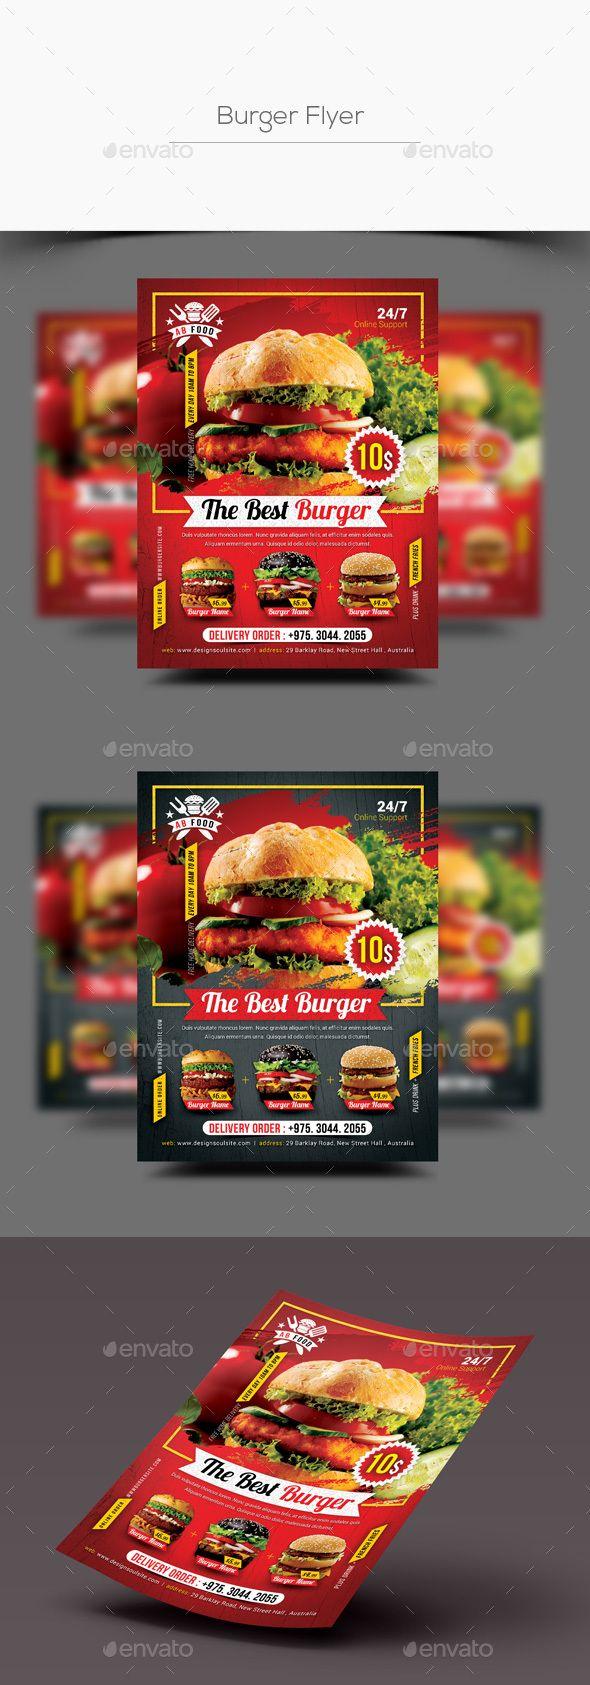 #Burger #Flyer - #Restaurant Flyers